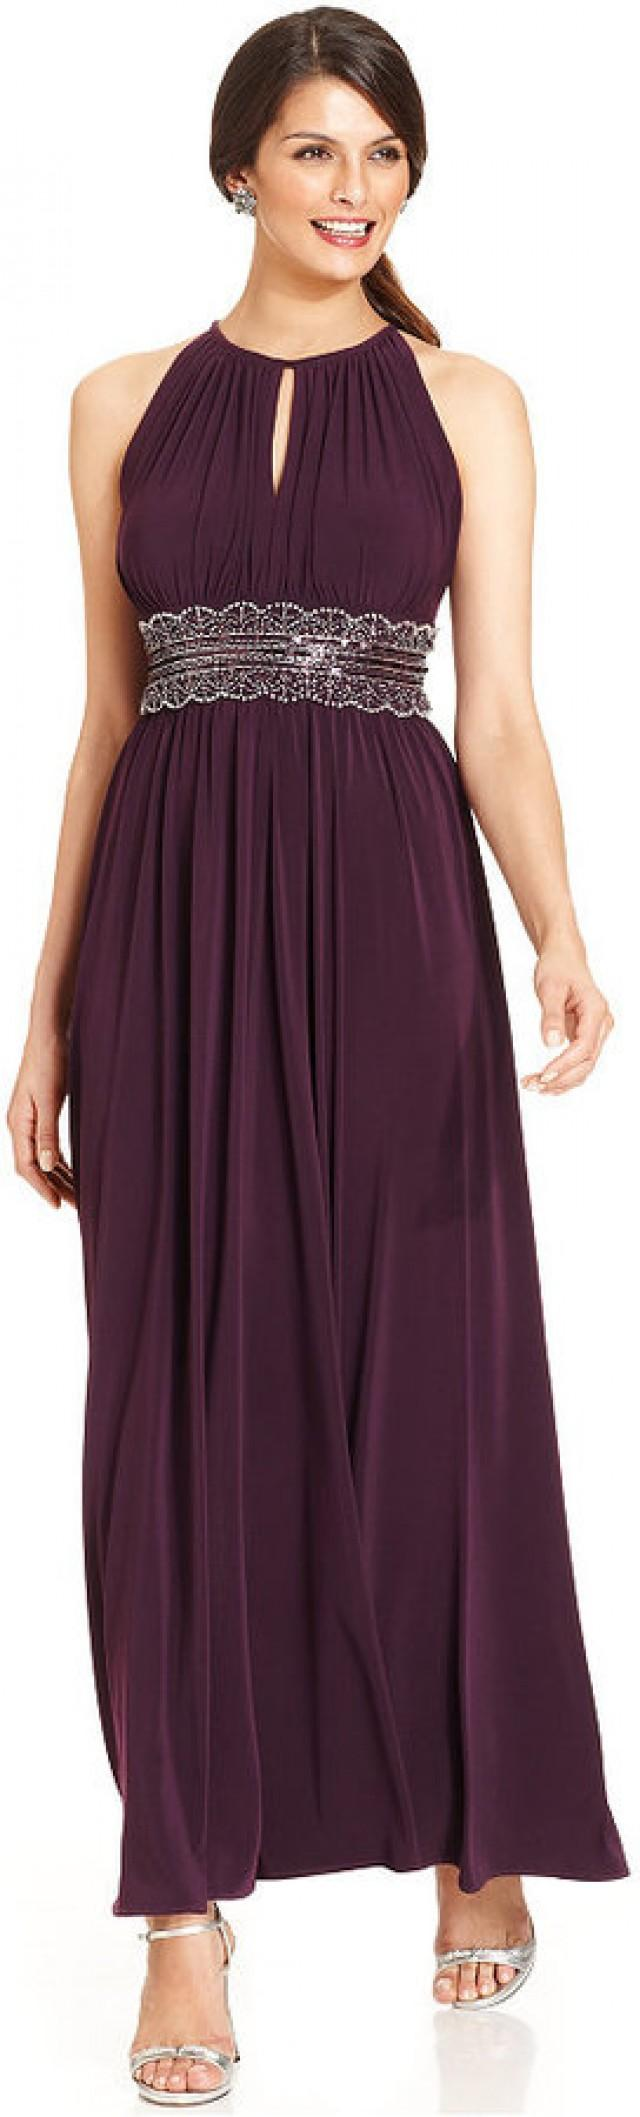 R&M Richards Petite Sleeveless Beaded Gown #2210191 - Weddbook